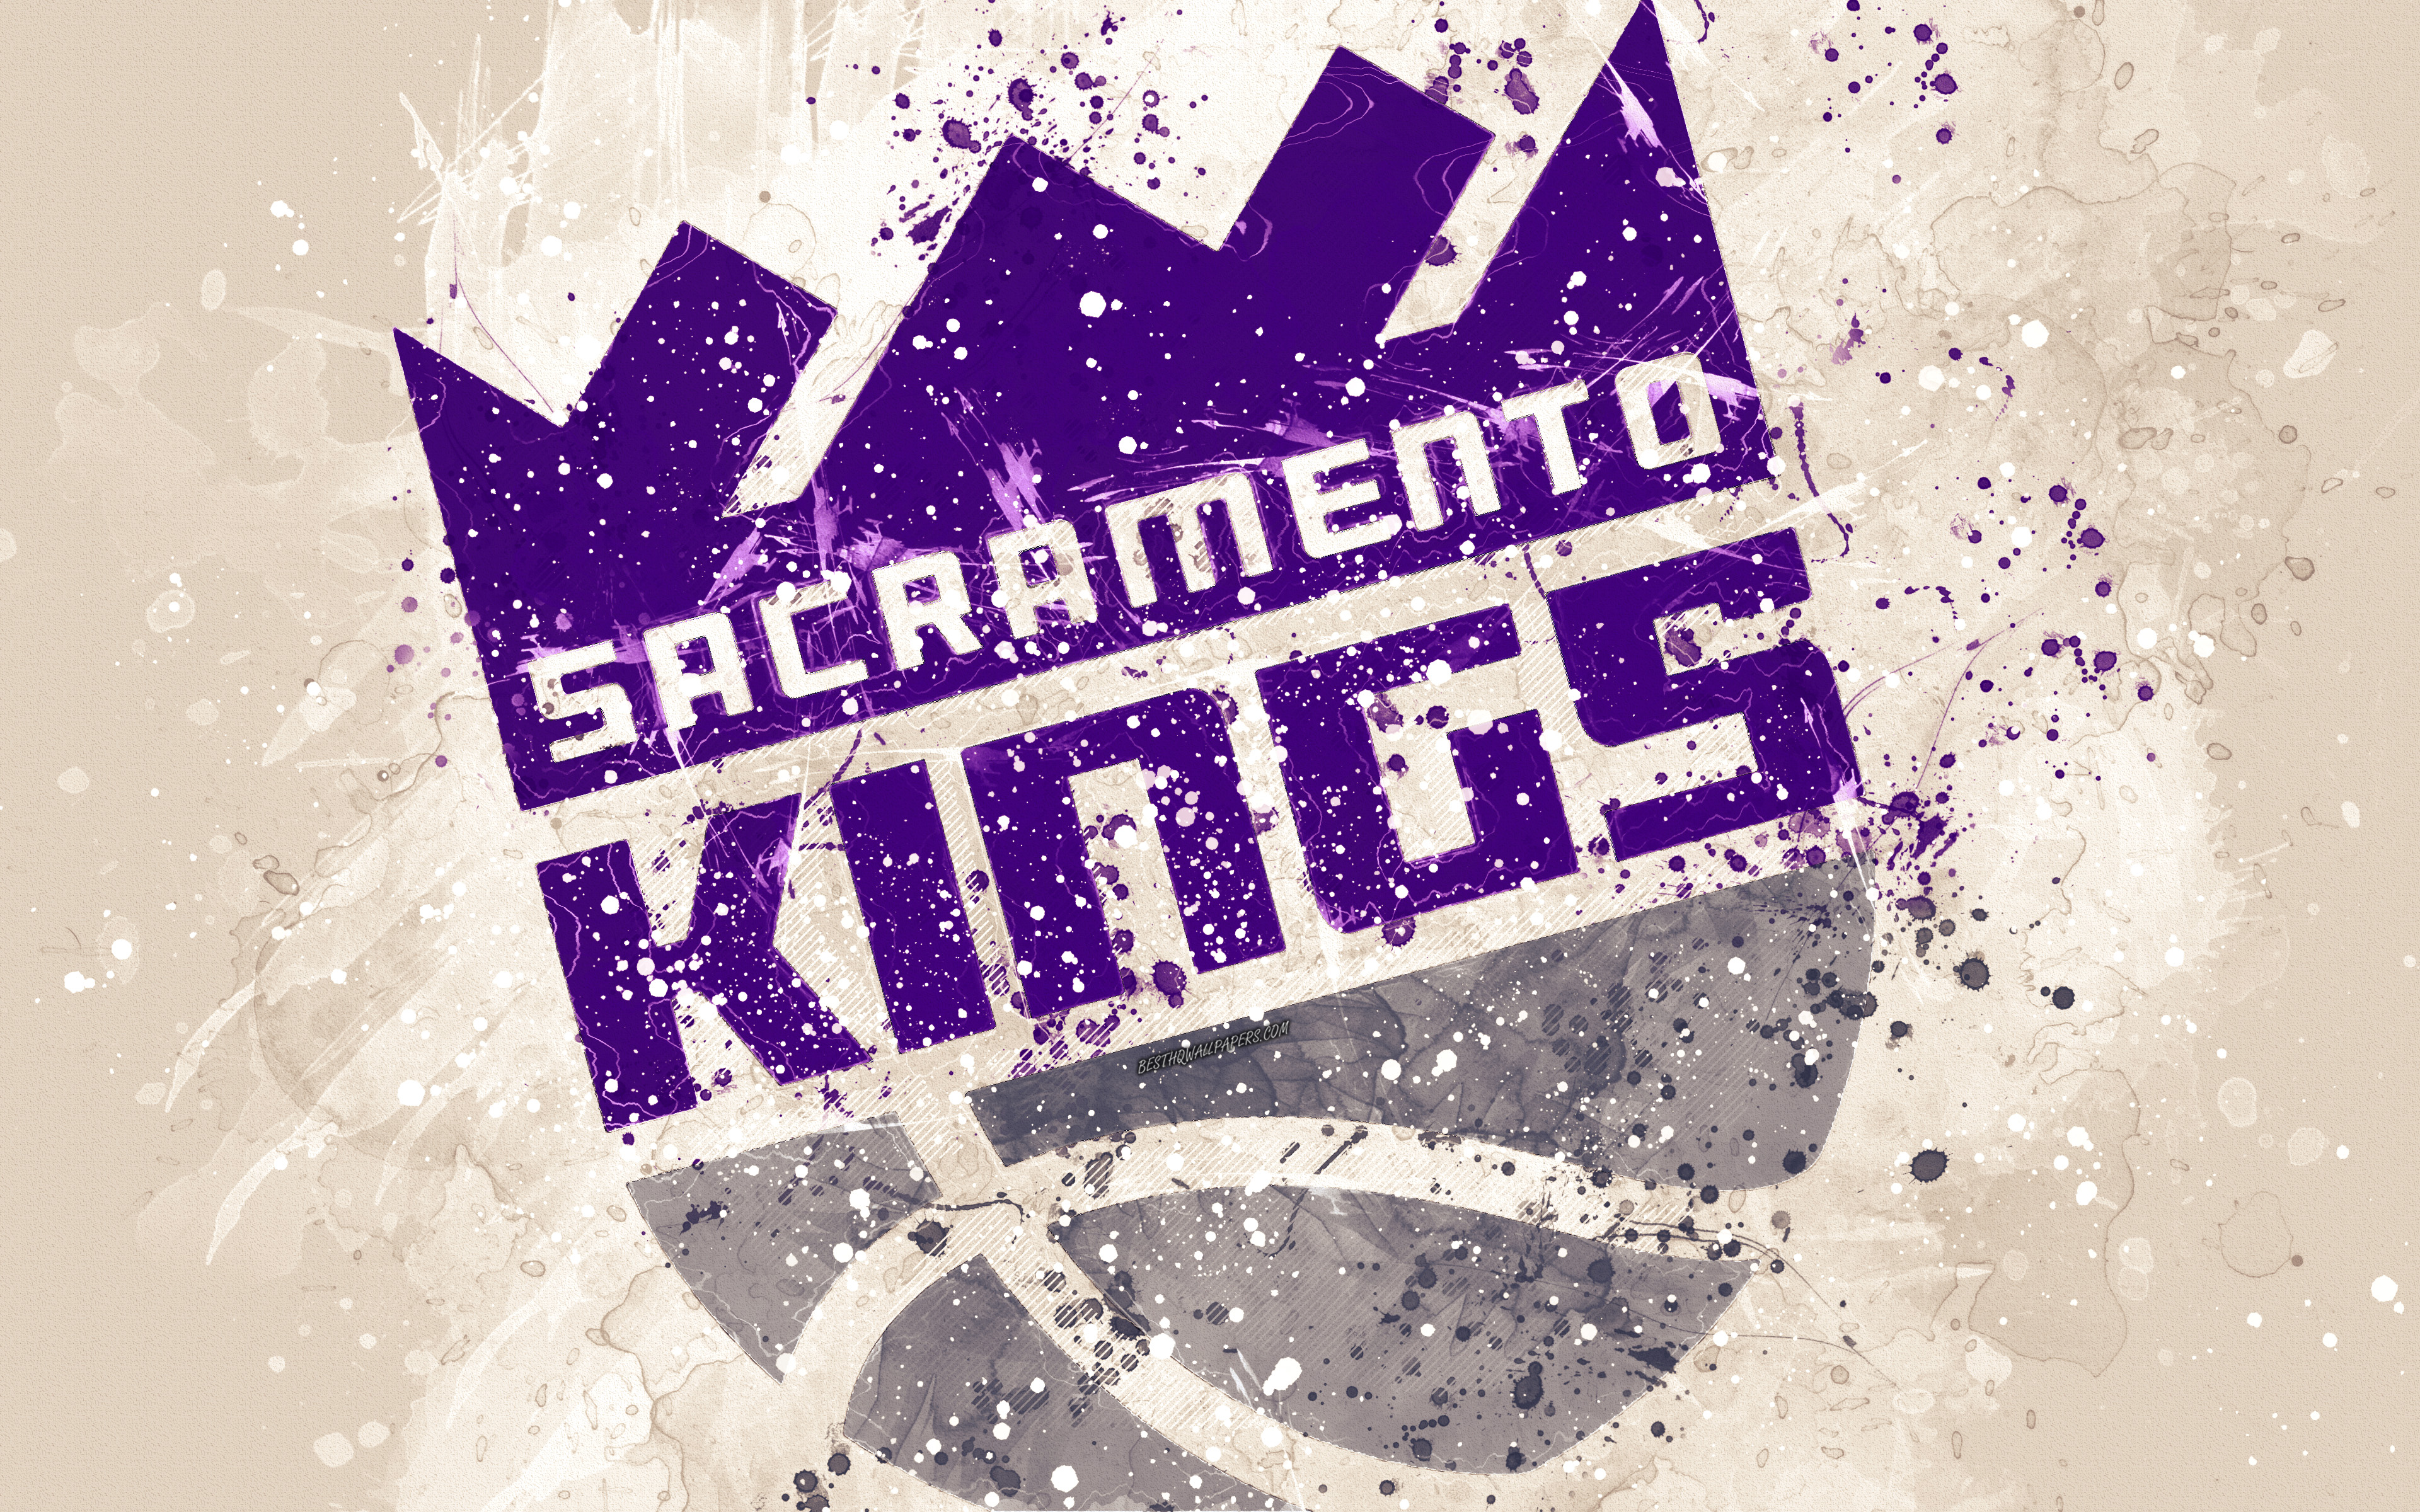 Sacramento Kings Logo 4k Ultra HD Wallpaper Background Image 3840x2400